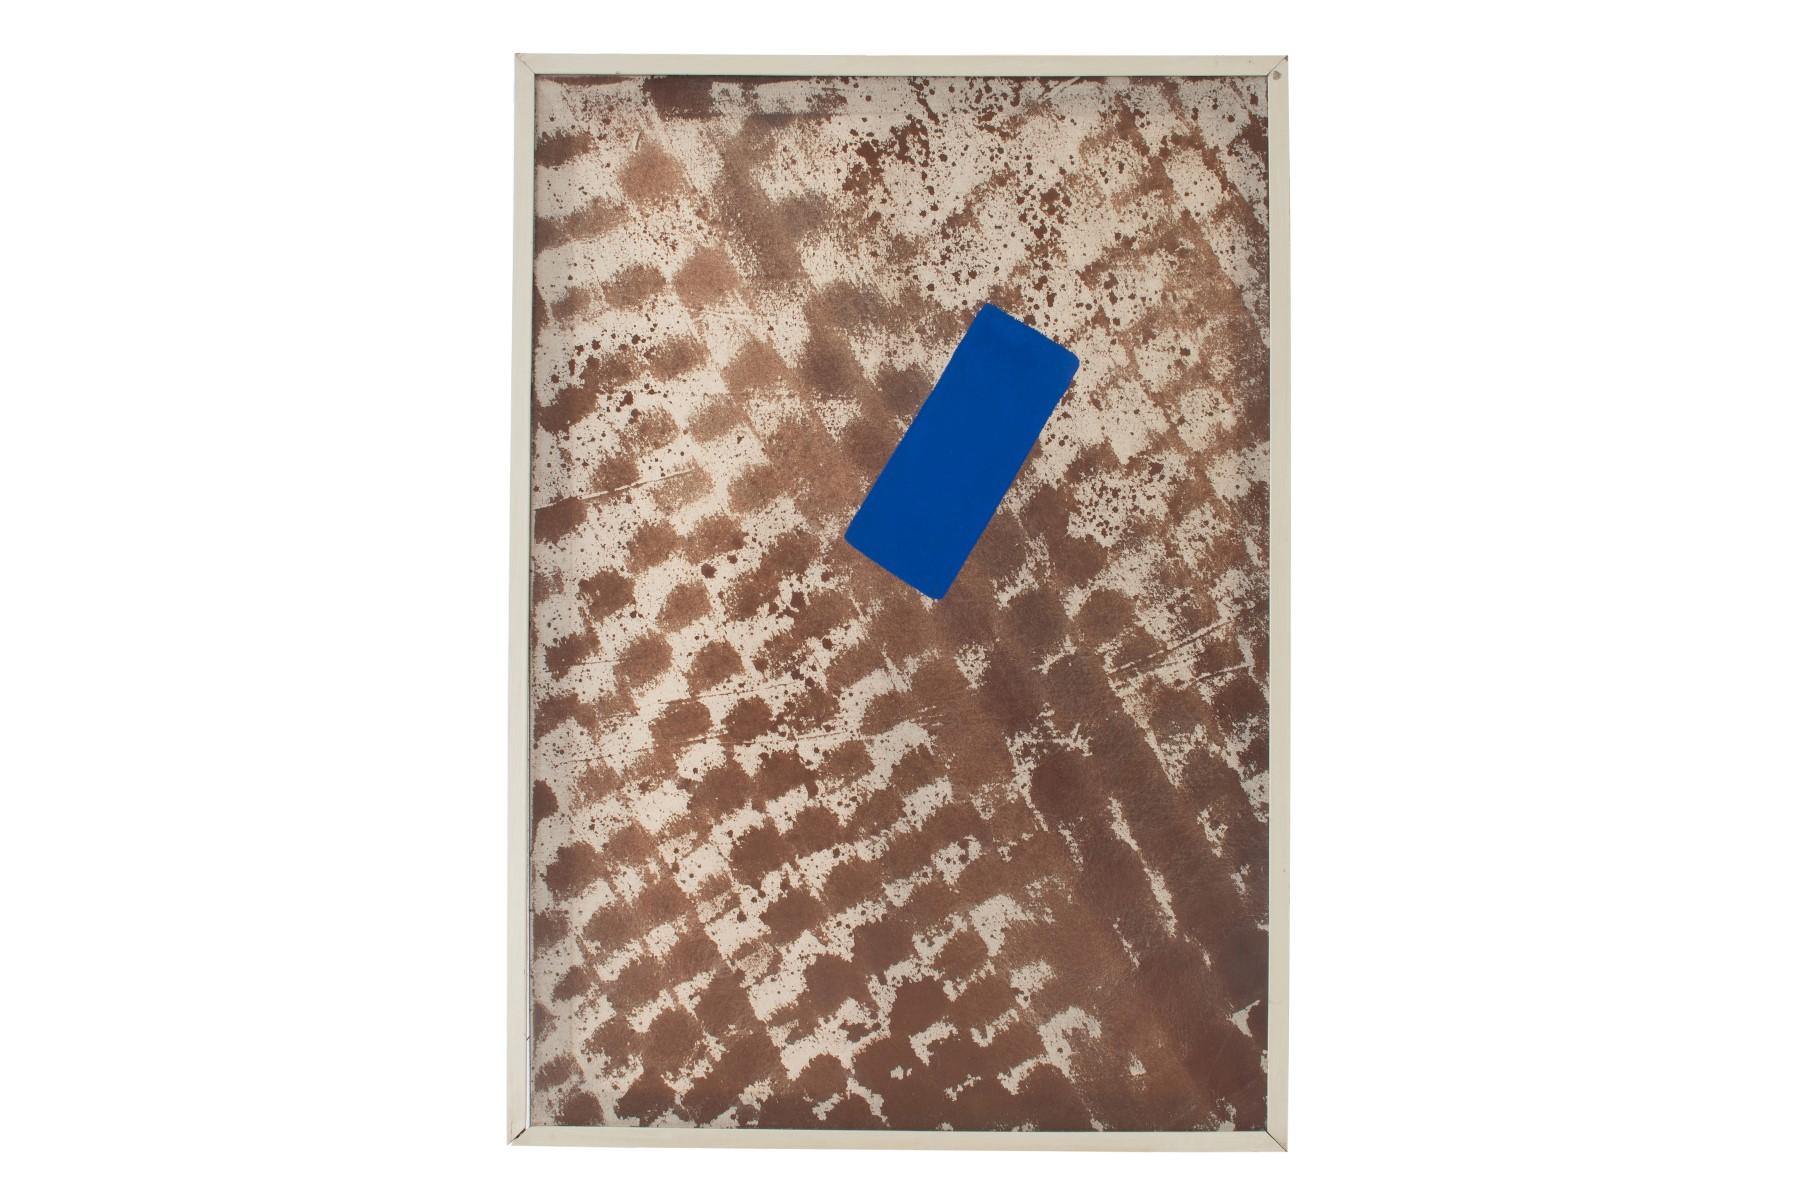 #53 Franz Vana* (1951), Abstract Compositions   Franz Vana* (1951), Abstrakte Komposition 1986 Image